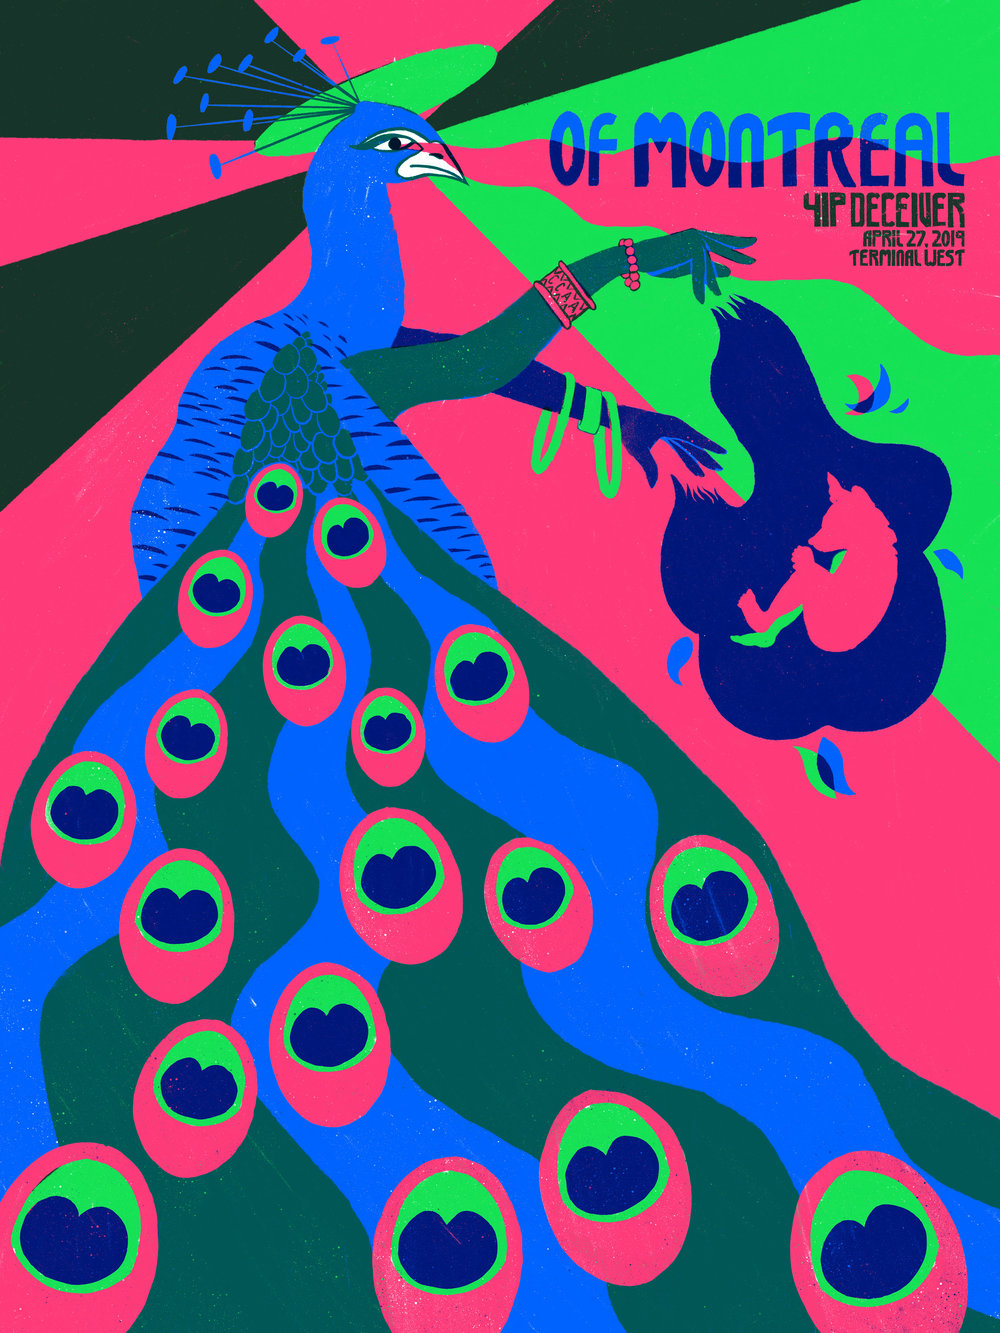 Screenprinting — Of Montreal Gig Poster